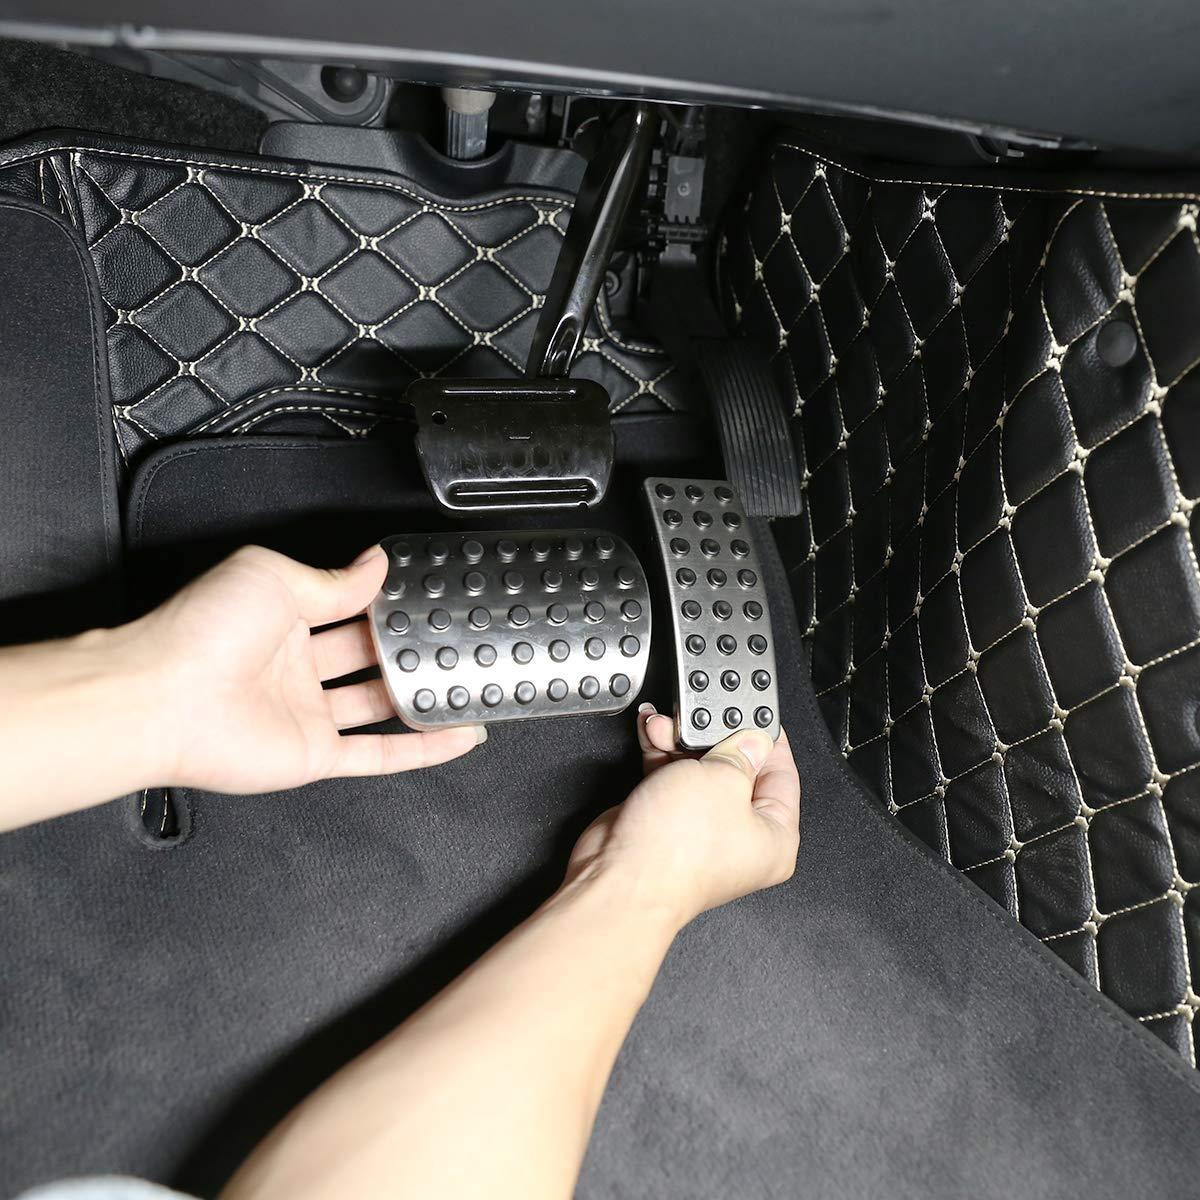 2 pedales de freno de combustible de acero inoxidable para coches clase A W176 B-CLass W246 CLA C117 GLS GLE W166 ML R Class W251